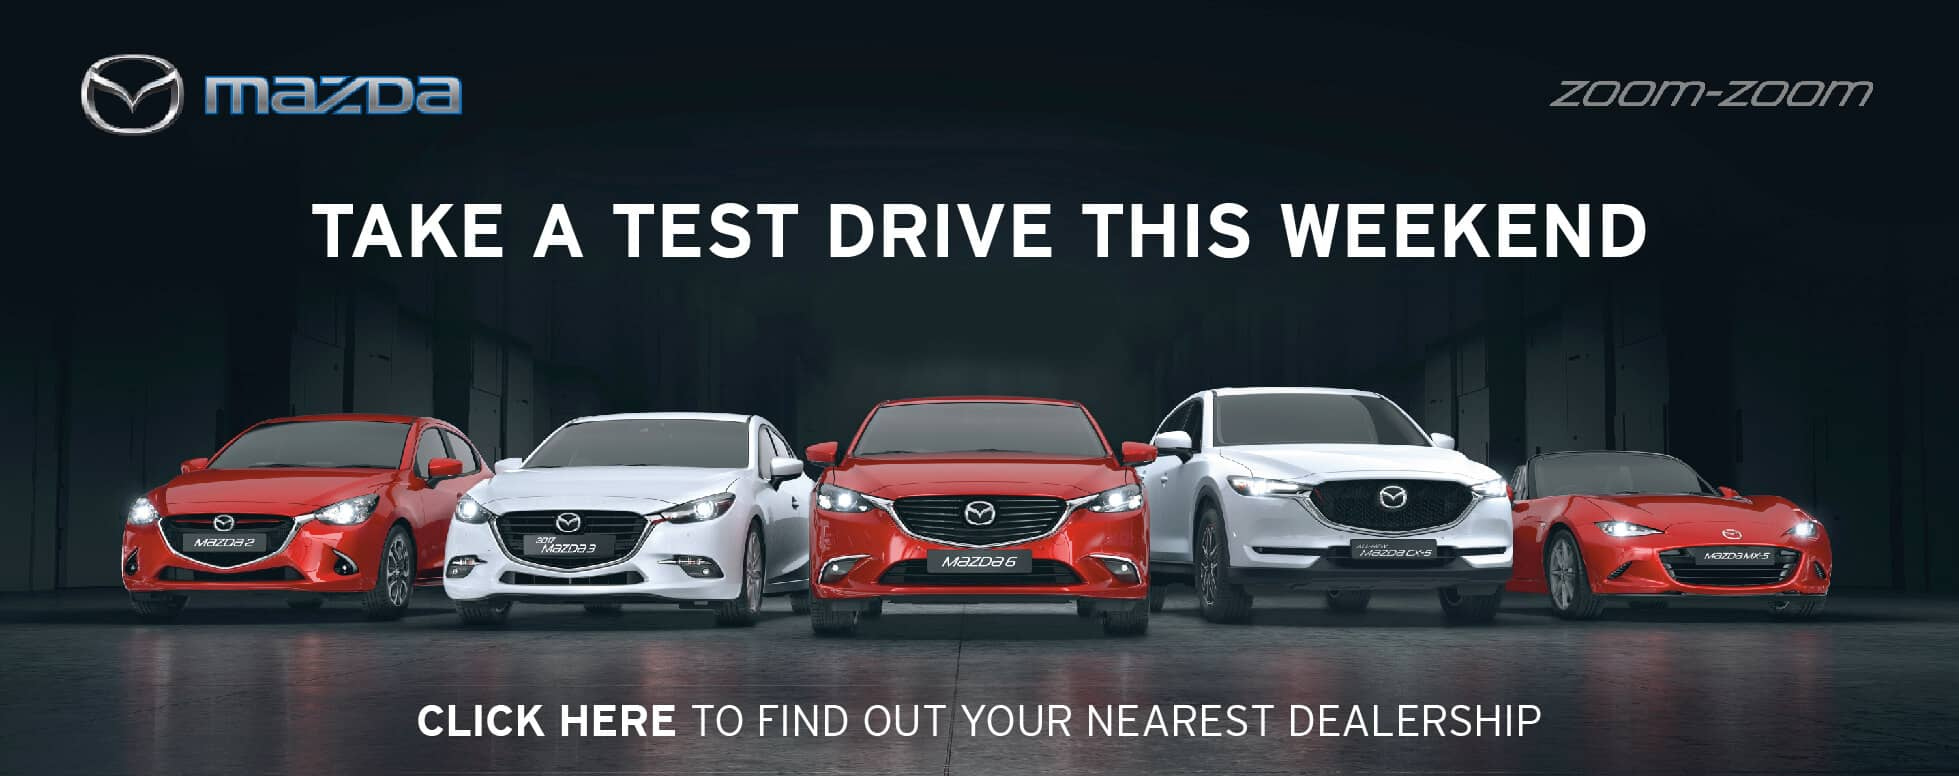 New Mazda deals   New Mazda cars for sale   Bristol Street Motors